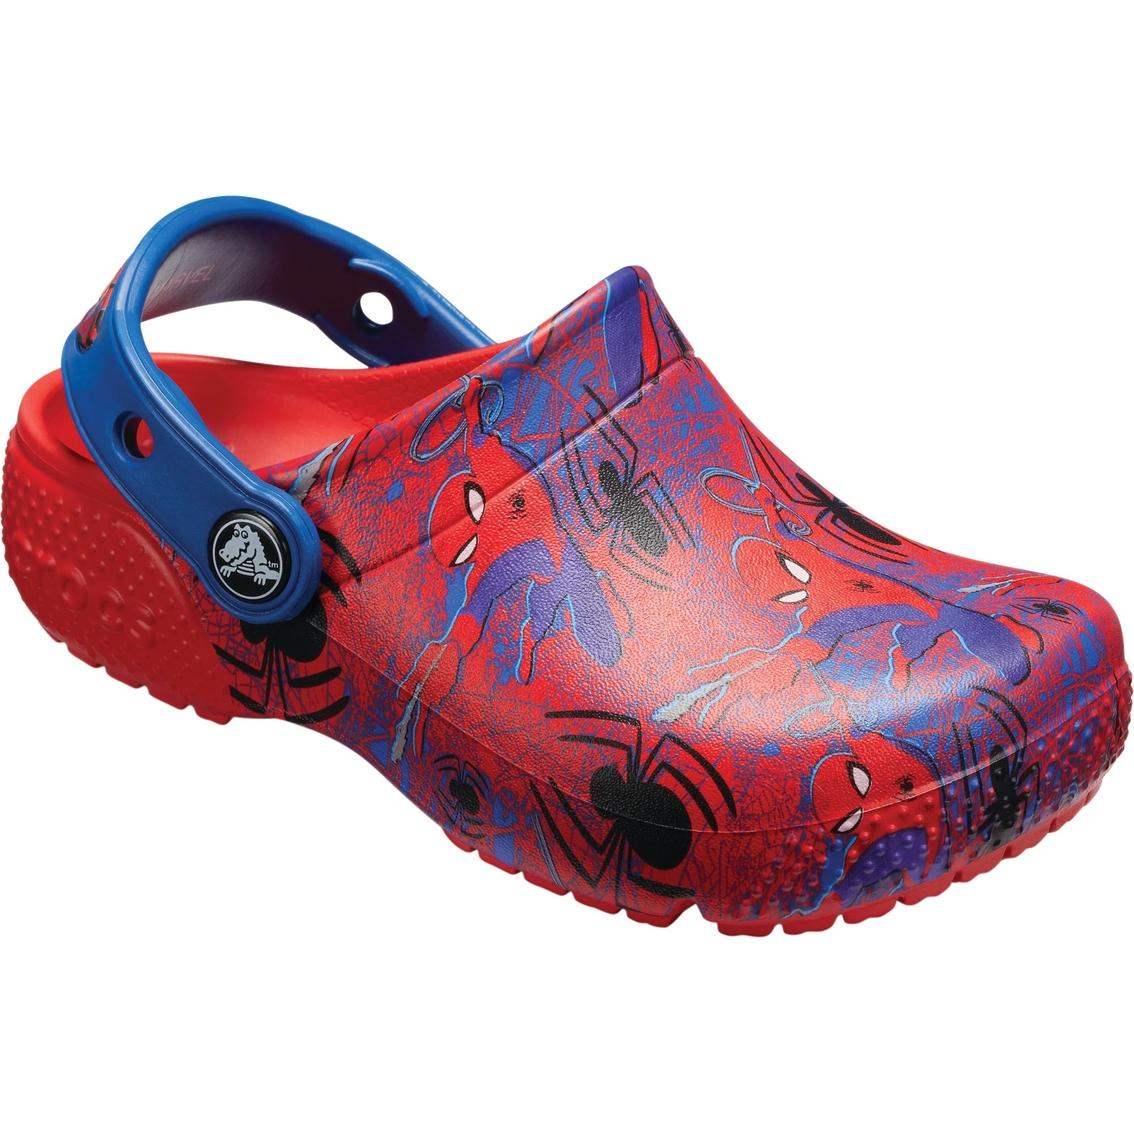 billigt pris lägre pris med senaste designen Crocs Boys Spider-man Graphic Clogs | Sandals | Shoes | Shop The ...